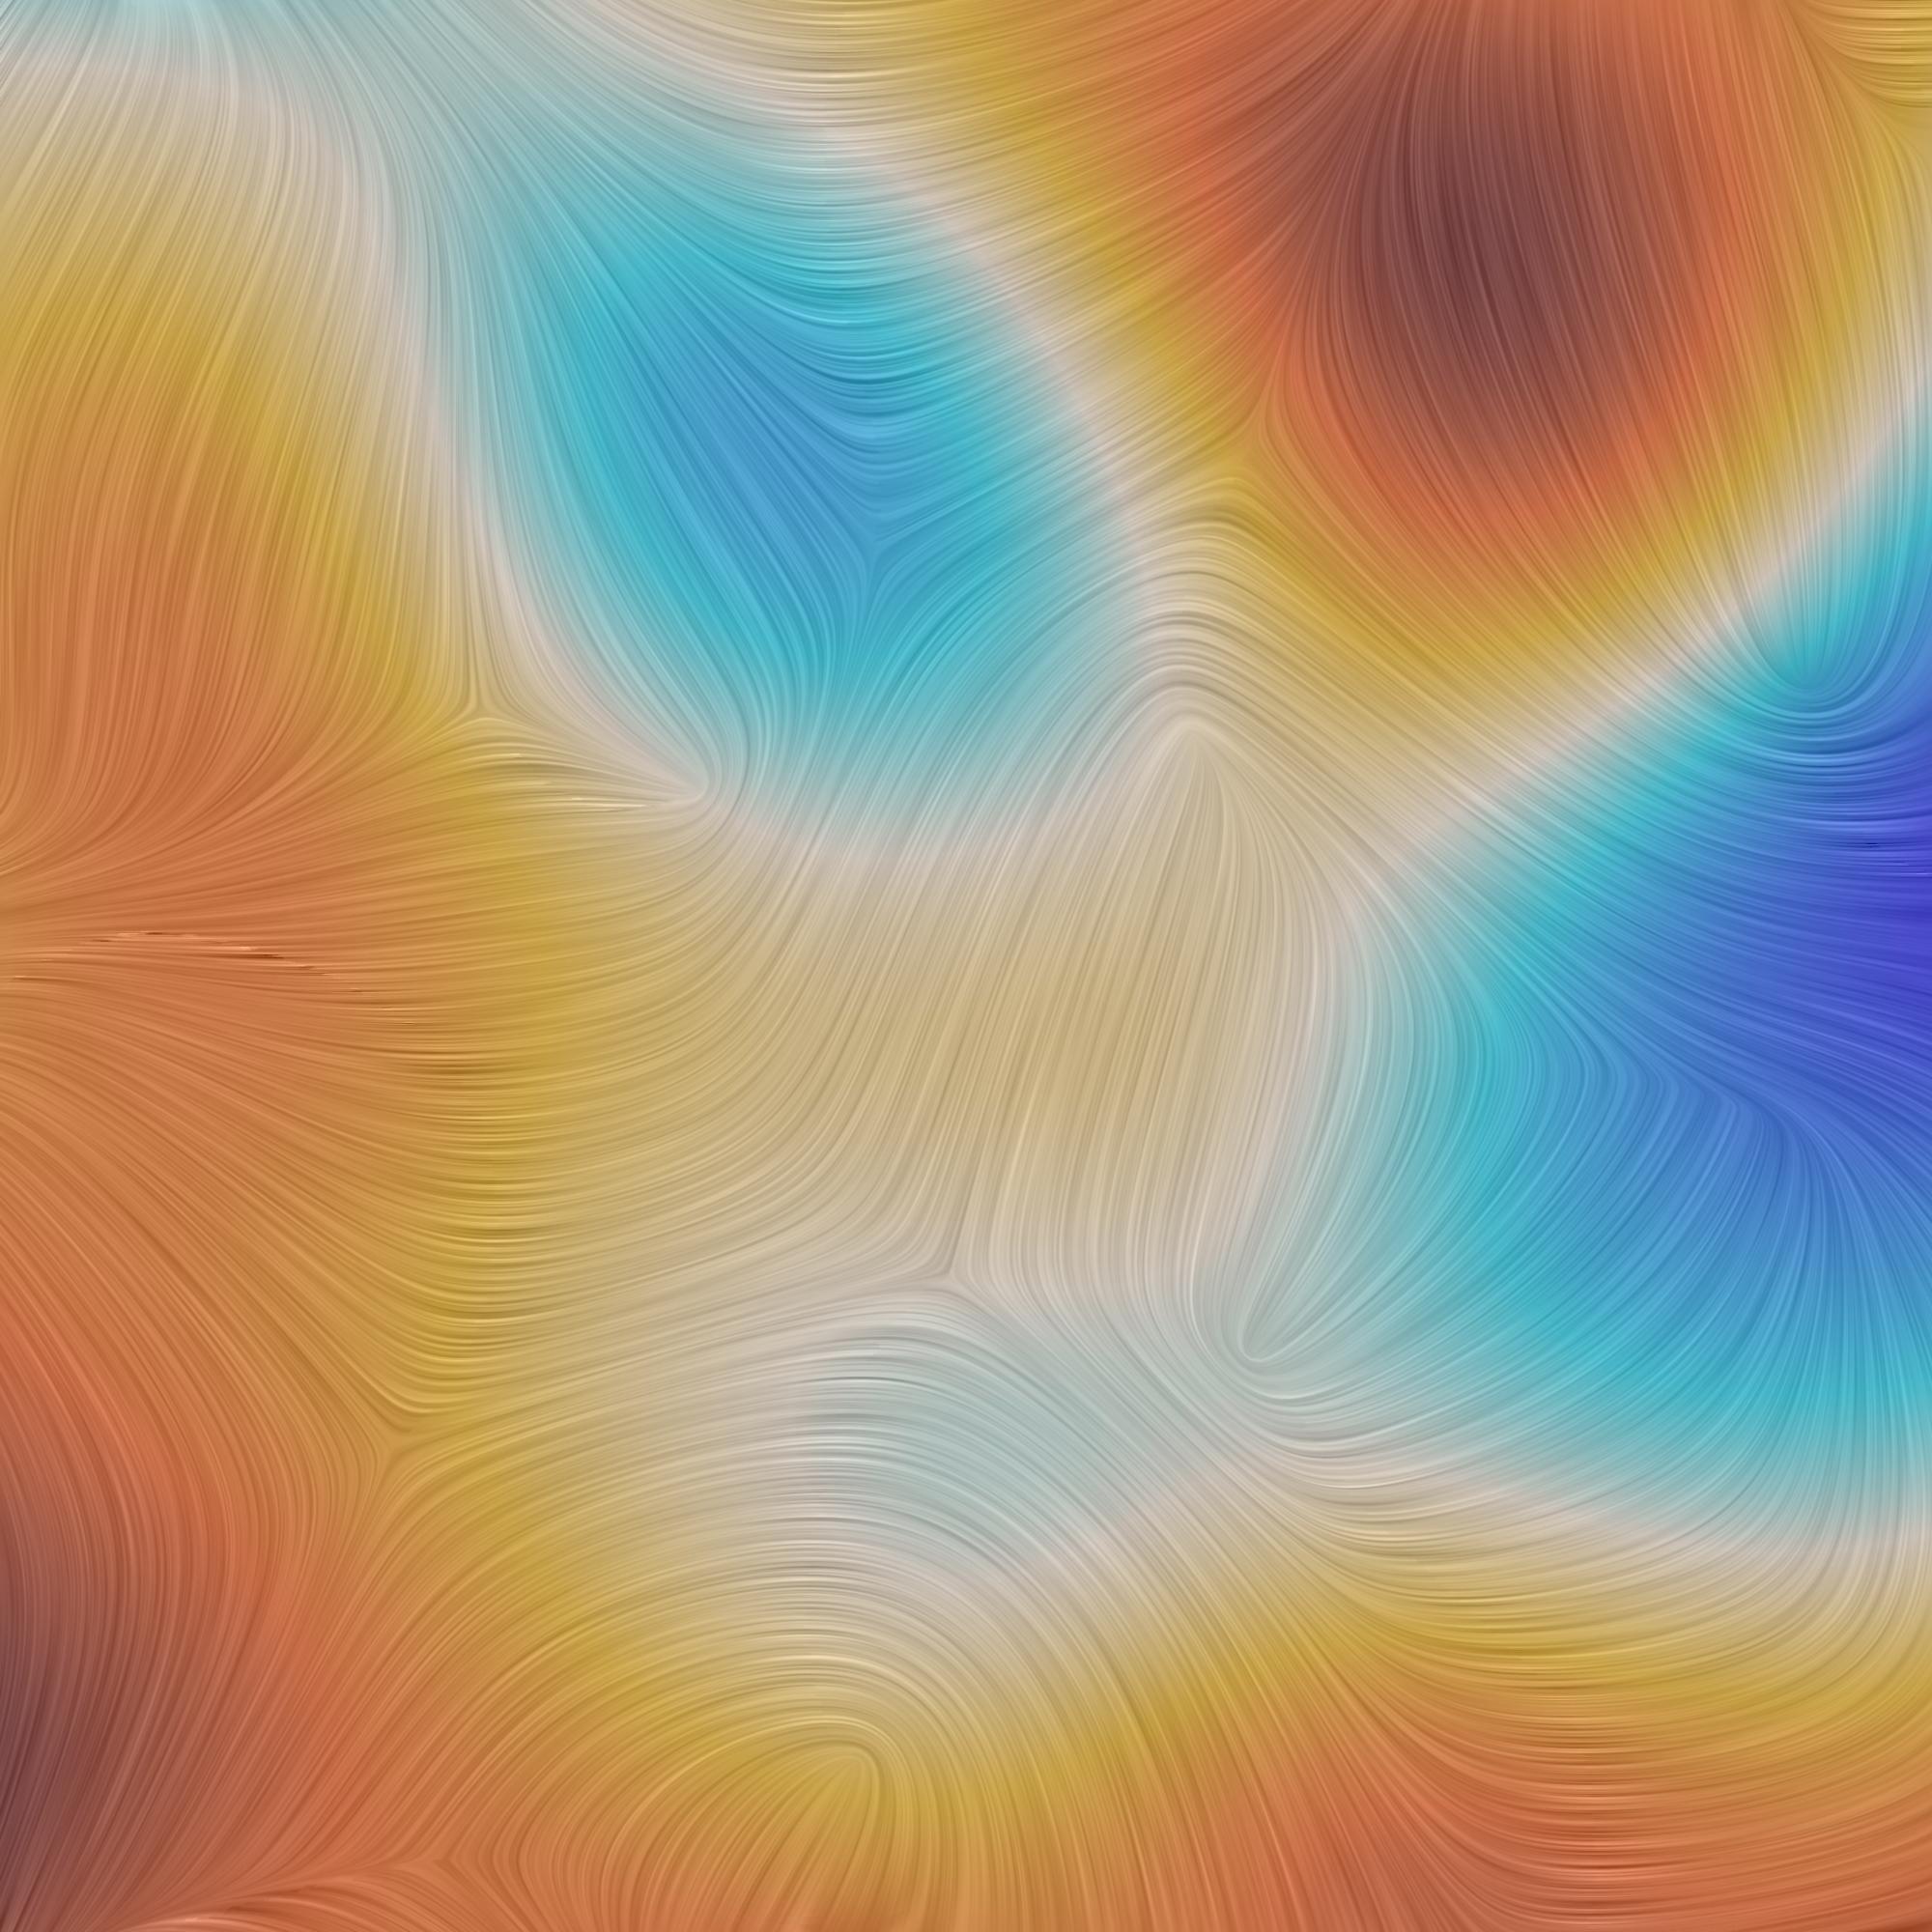 1567215914795-ESA_Planck_CMB_Polarisation_zoom_5deg.jpg